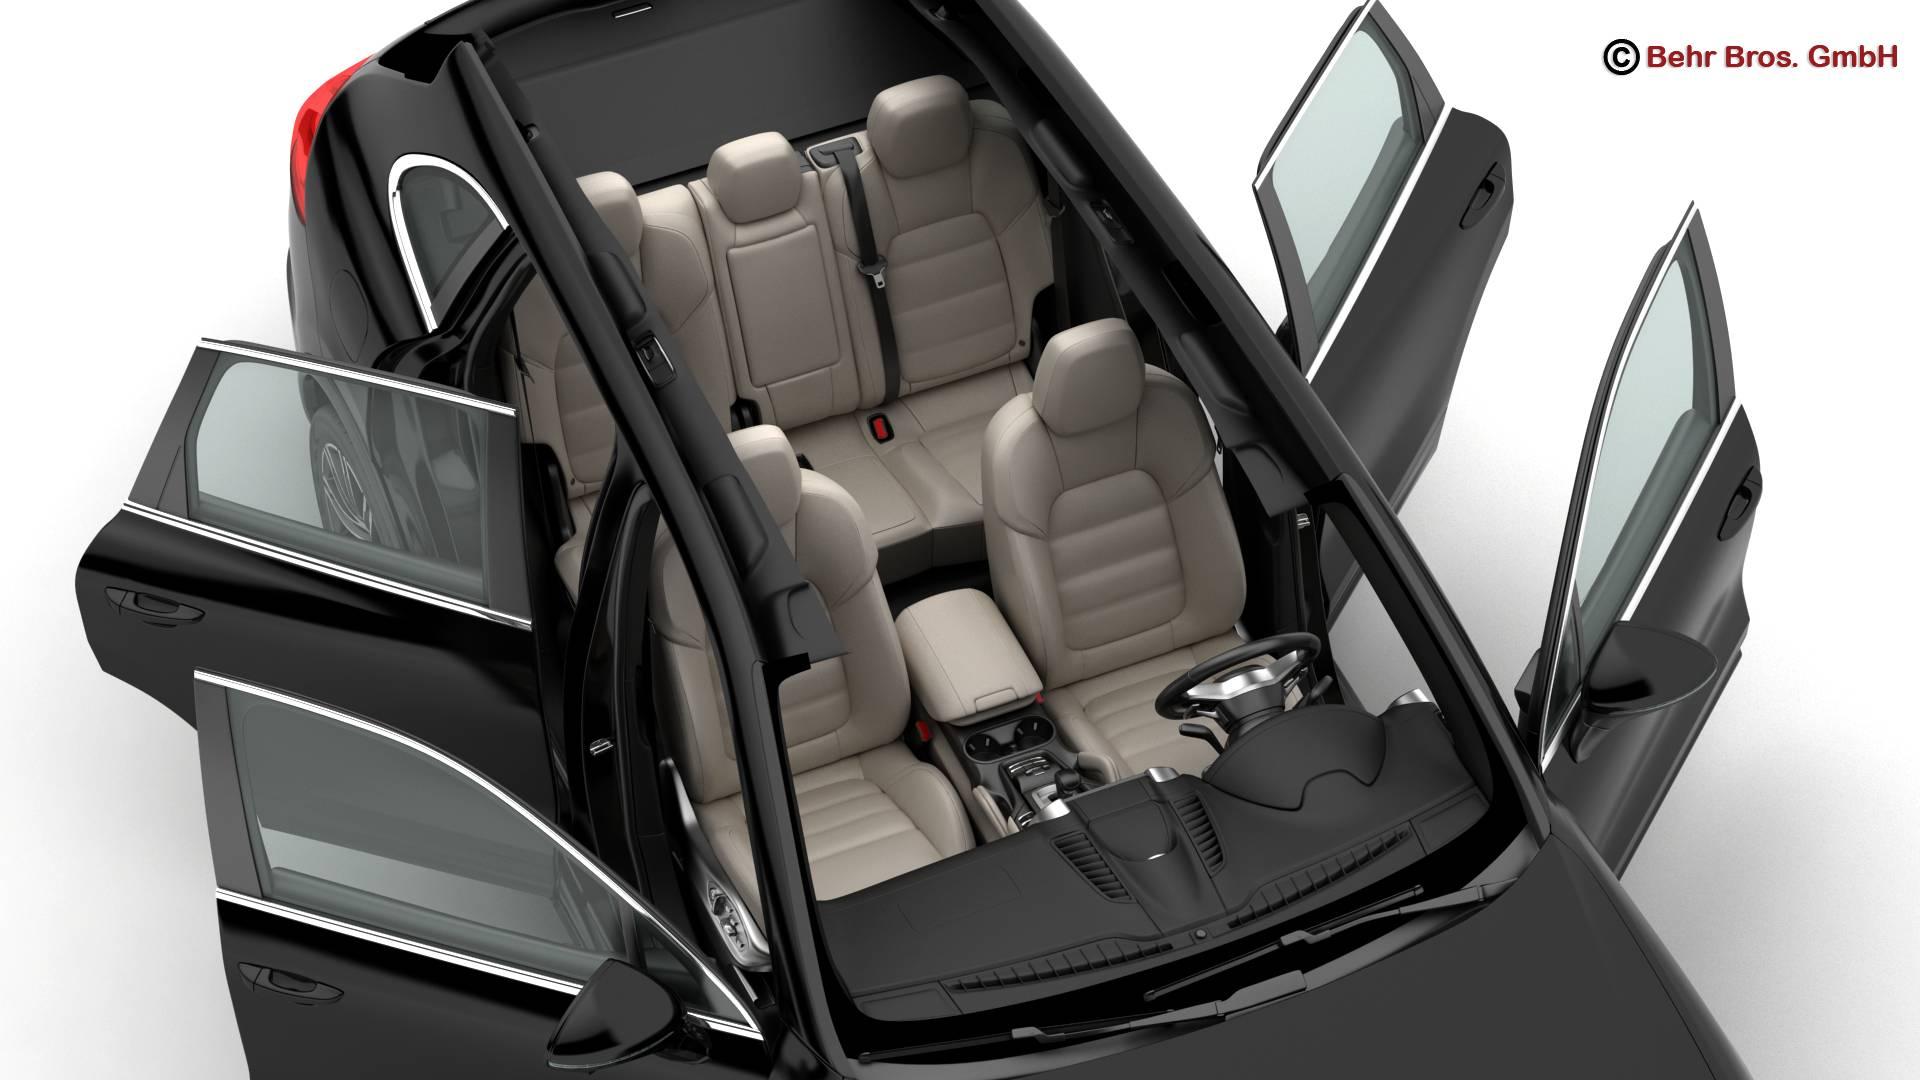 porsche cayenne turbo s 2016 3d model 3ds max fbx c4d lwo ma mb obj 214937